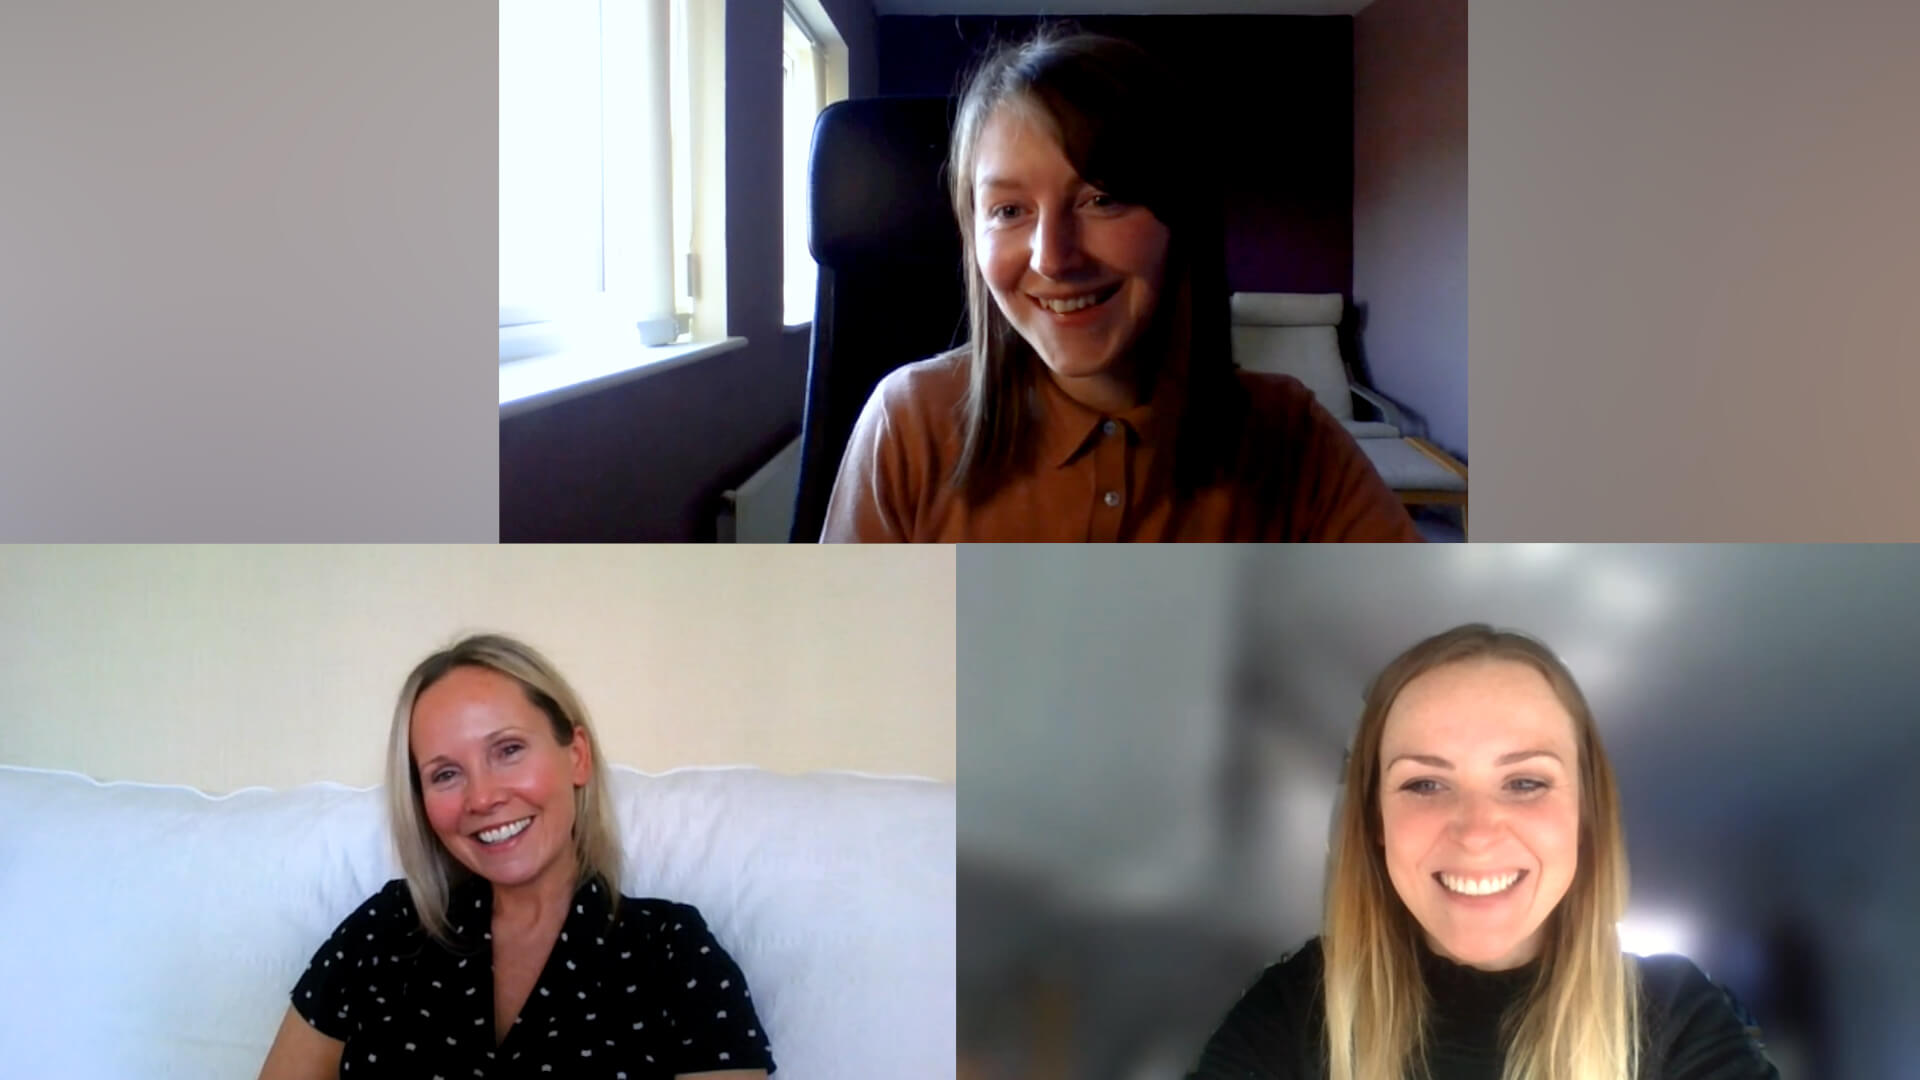 Image of performing arts webcast panel on Microsoft Teams